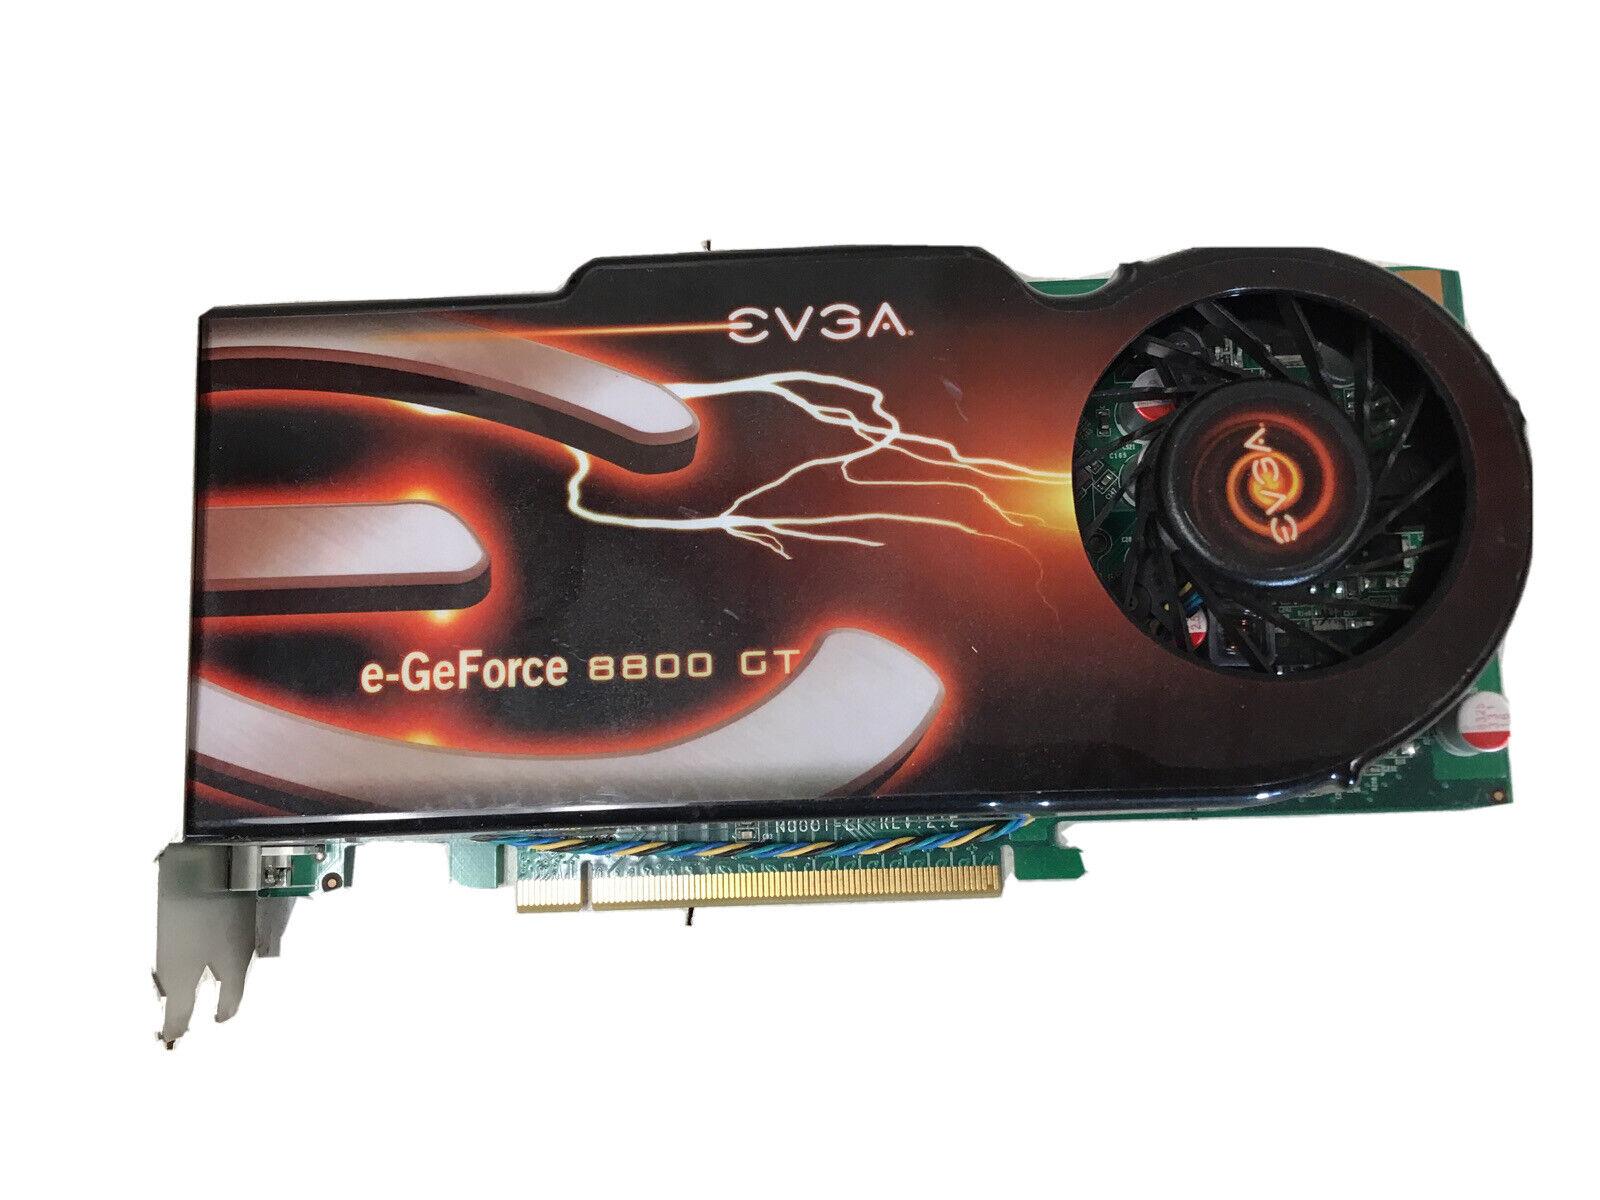 E-geforce 8800 GT PCI-E Video Card 512MB DDR3 Dual Slot 512-P3-N800-TR